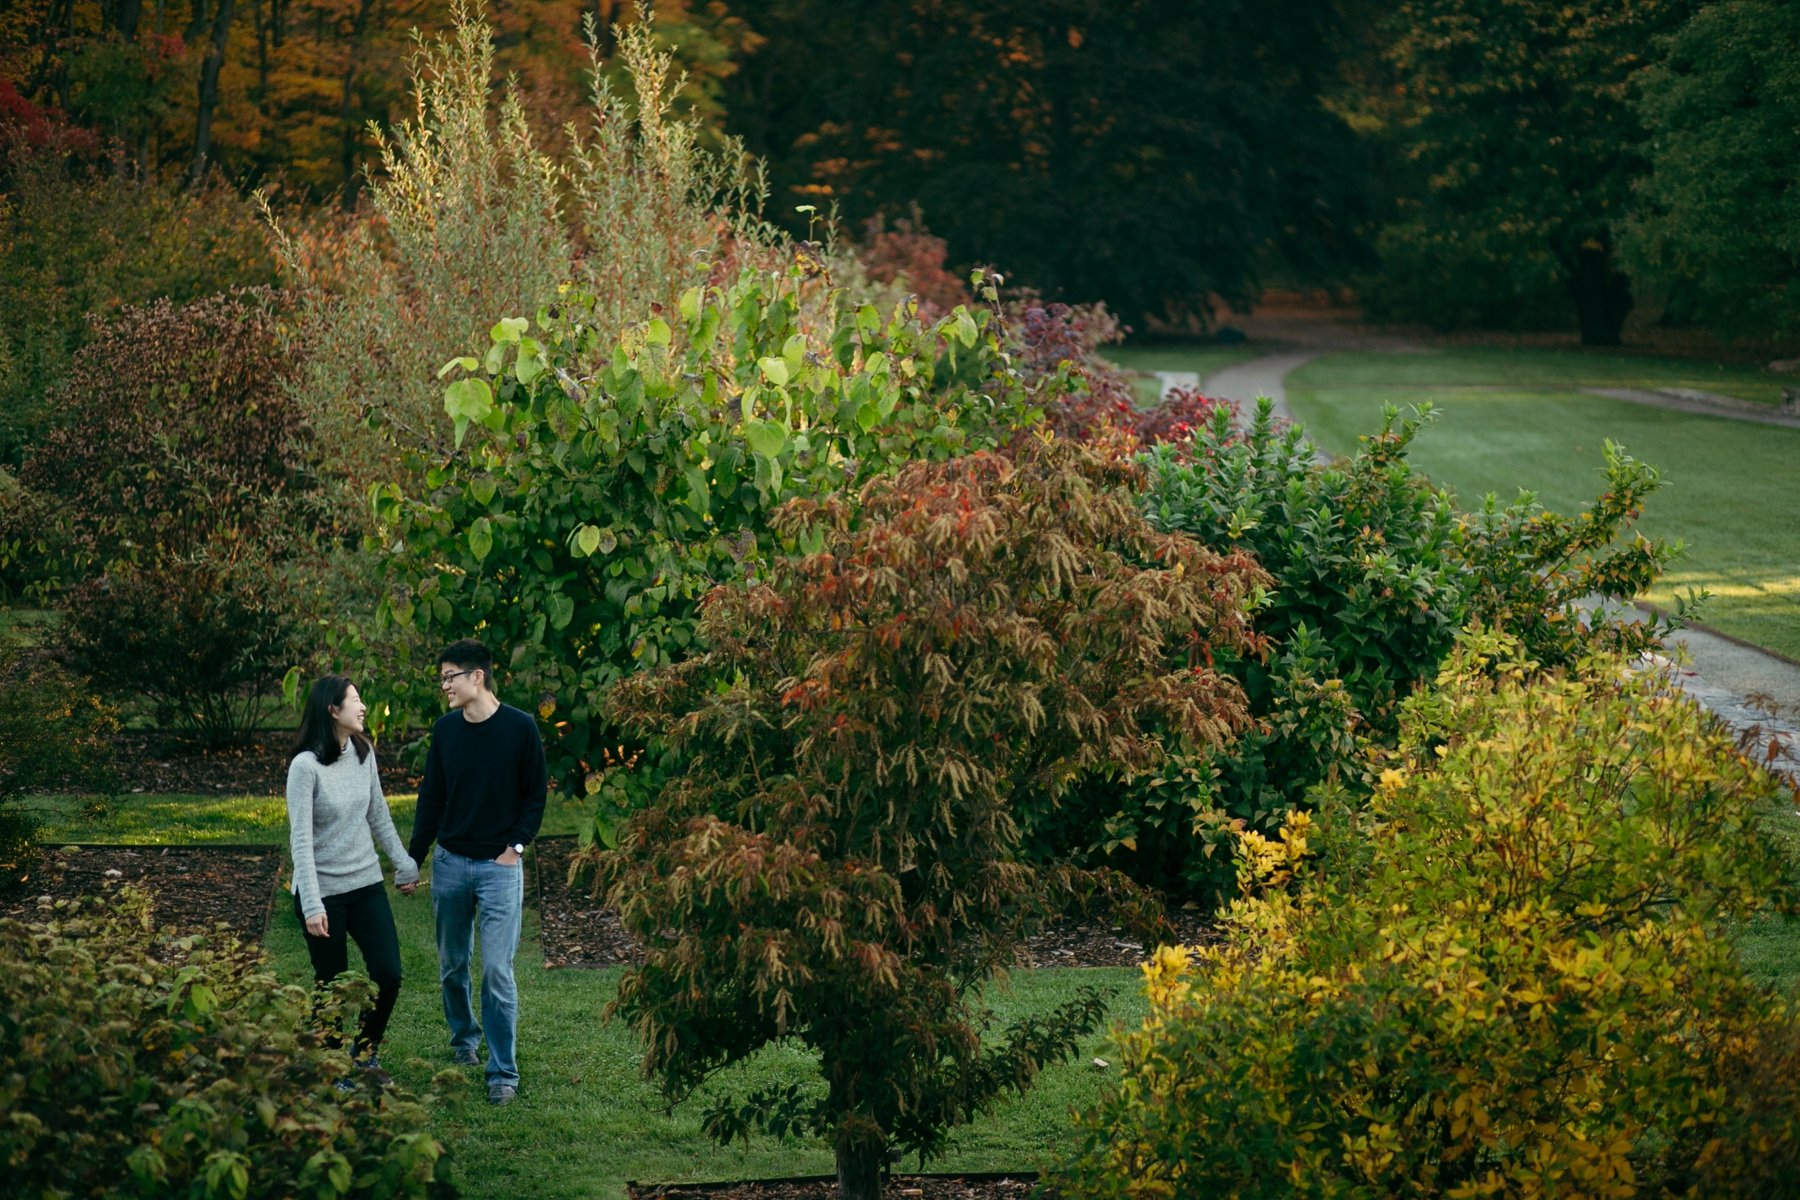 Bailey-Q-Photo-Arnold-Arboretum-Boston-Engagement-009.JPG